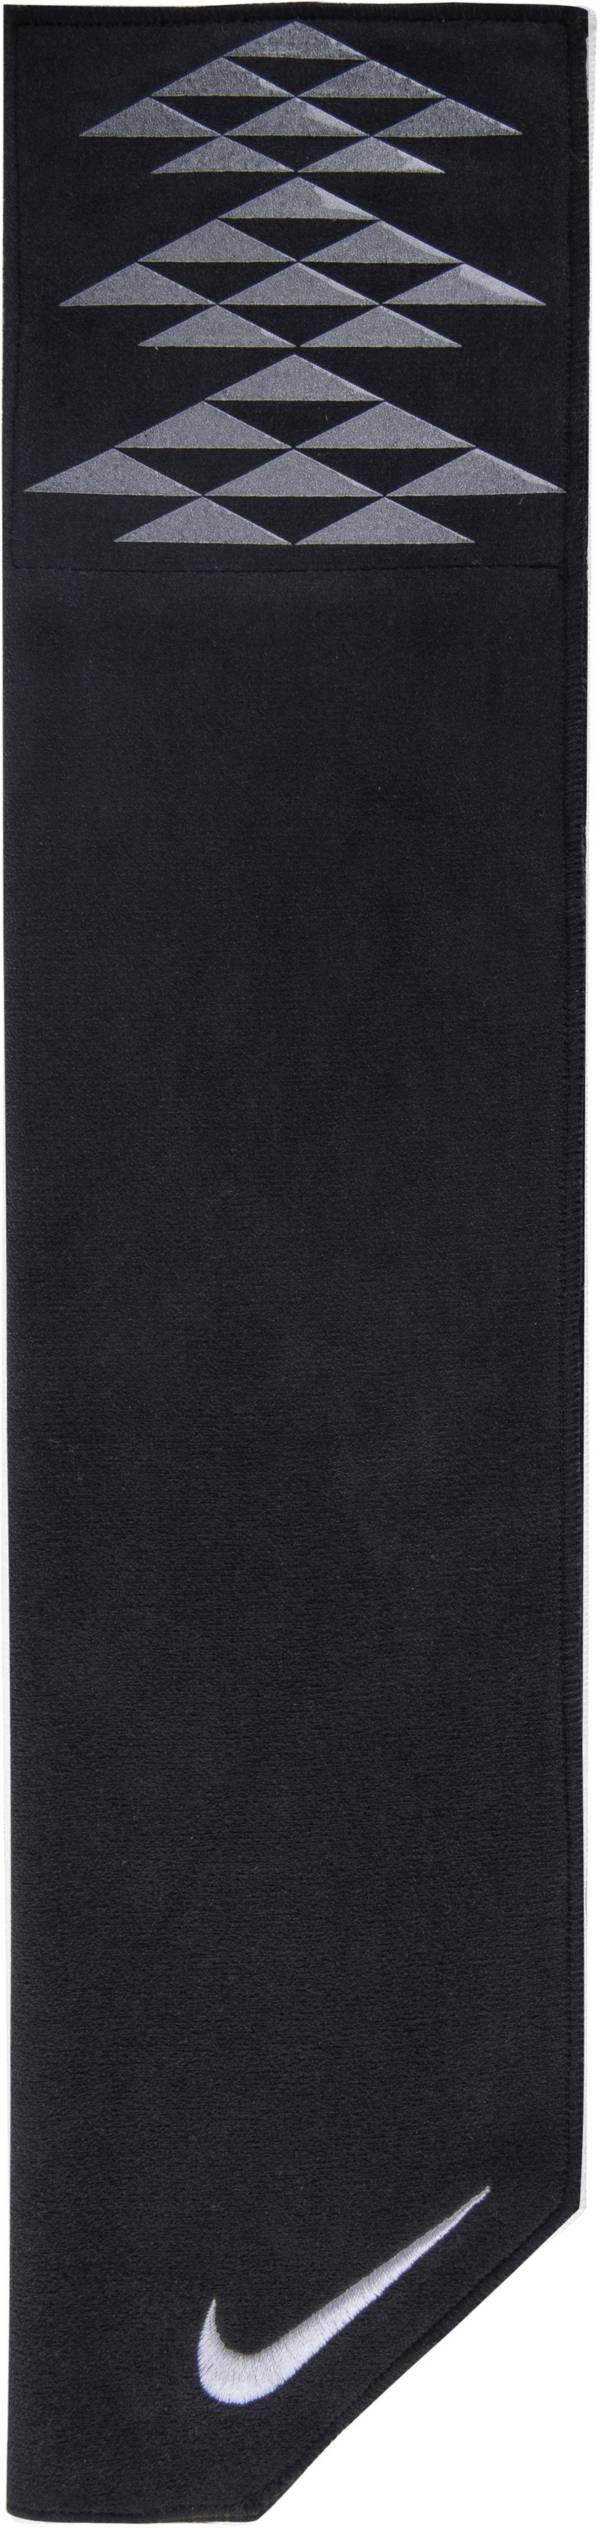 Nike Vapor Football Towel product image